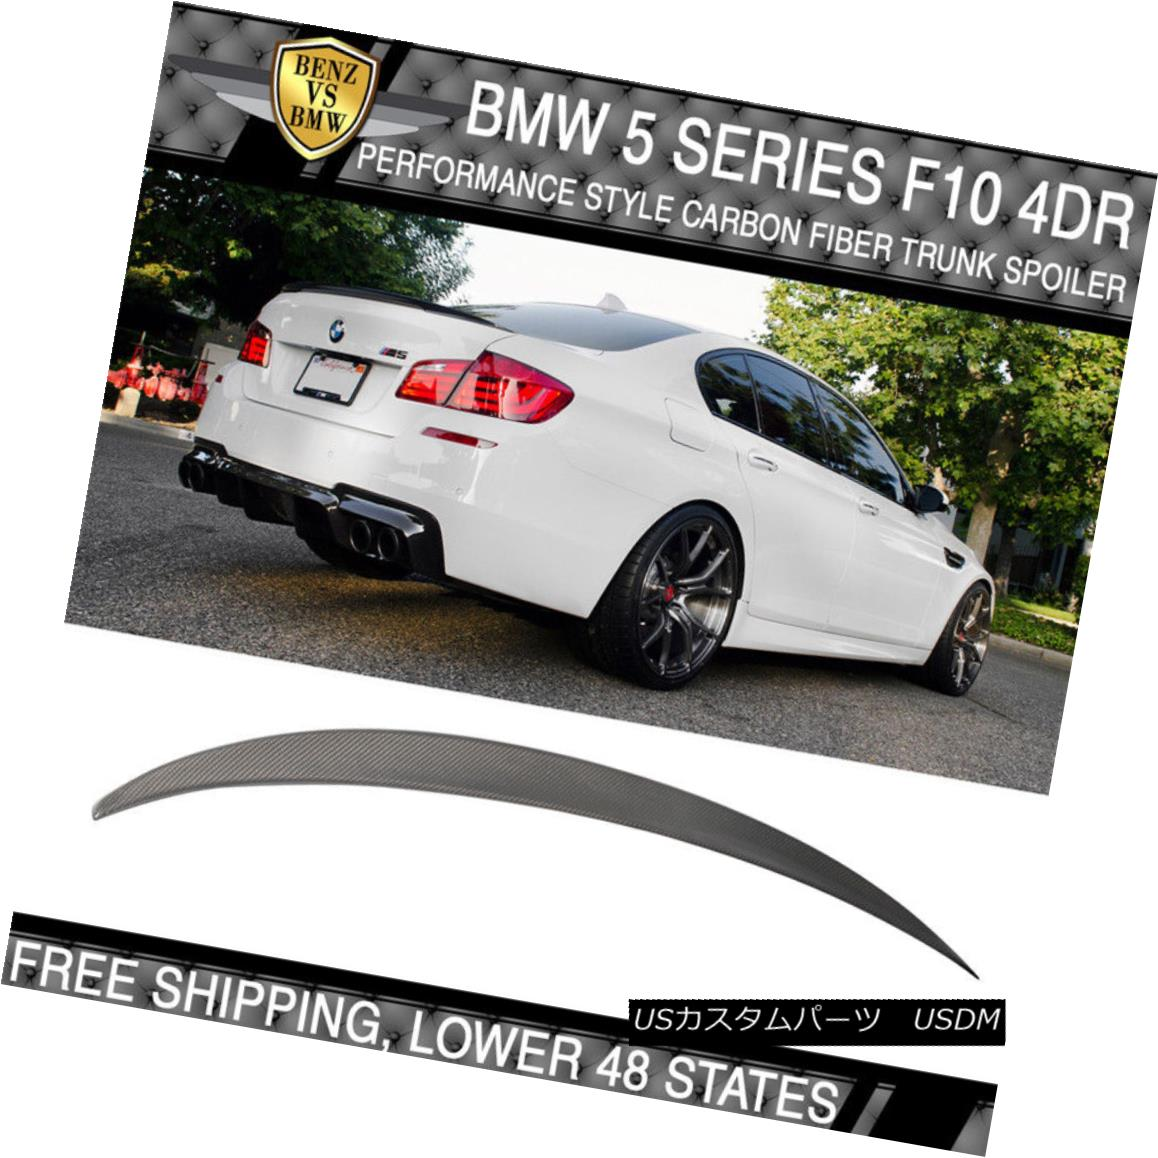 2011 Fits Nissan Sentra SE-R Spec V Max Performance Metallic Brake Pads F